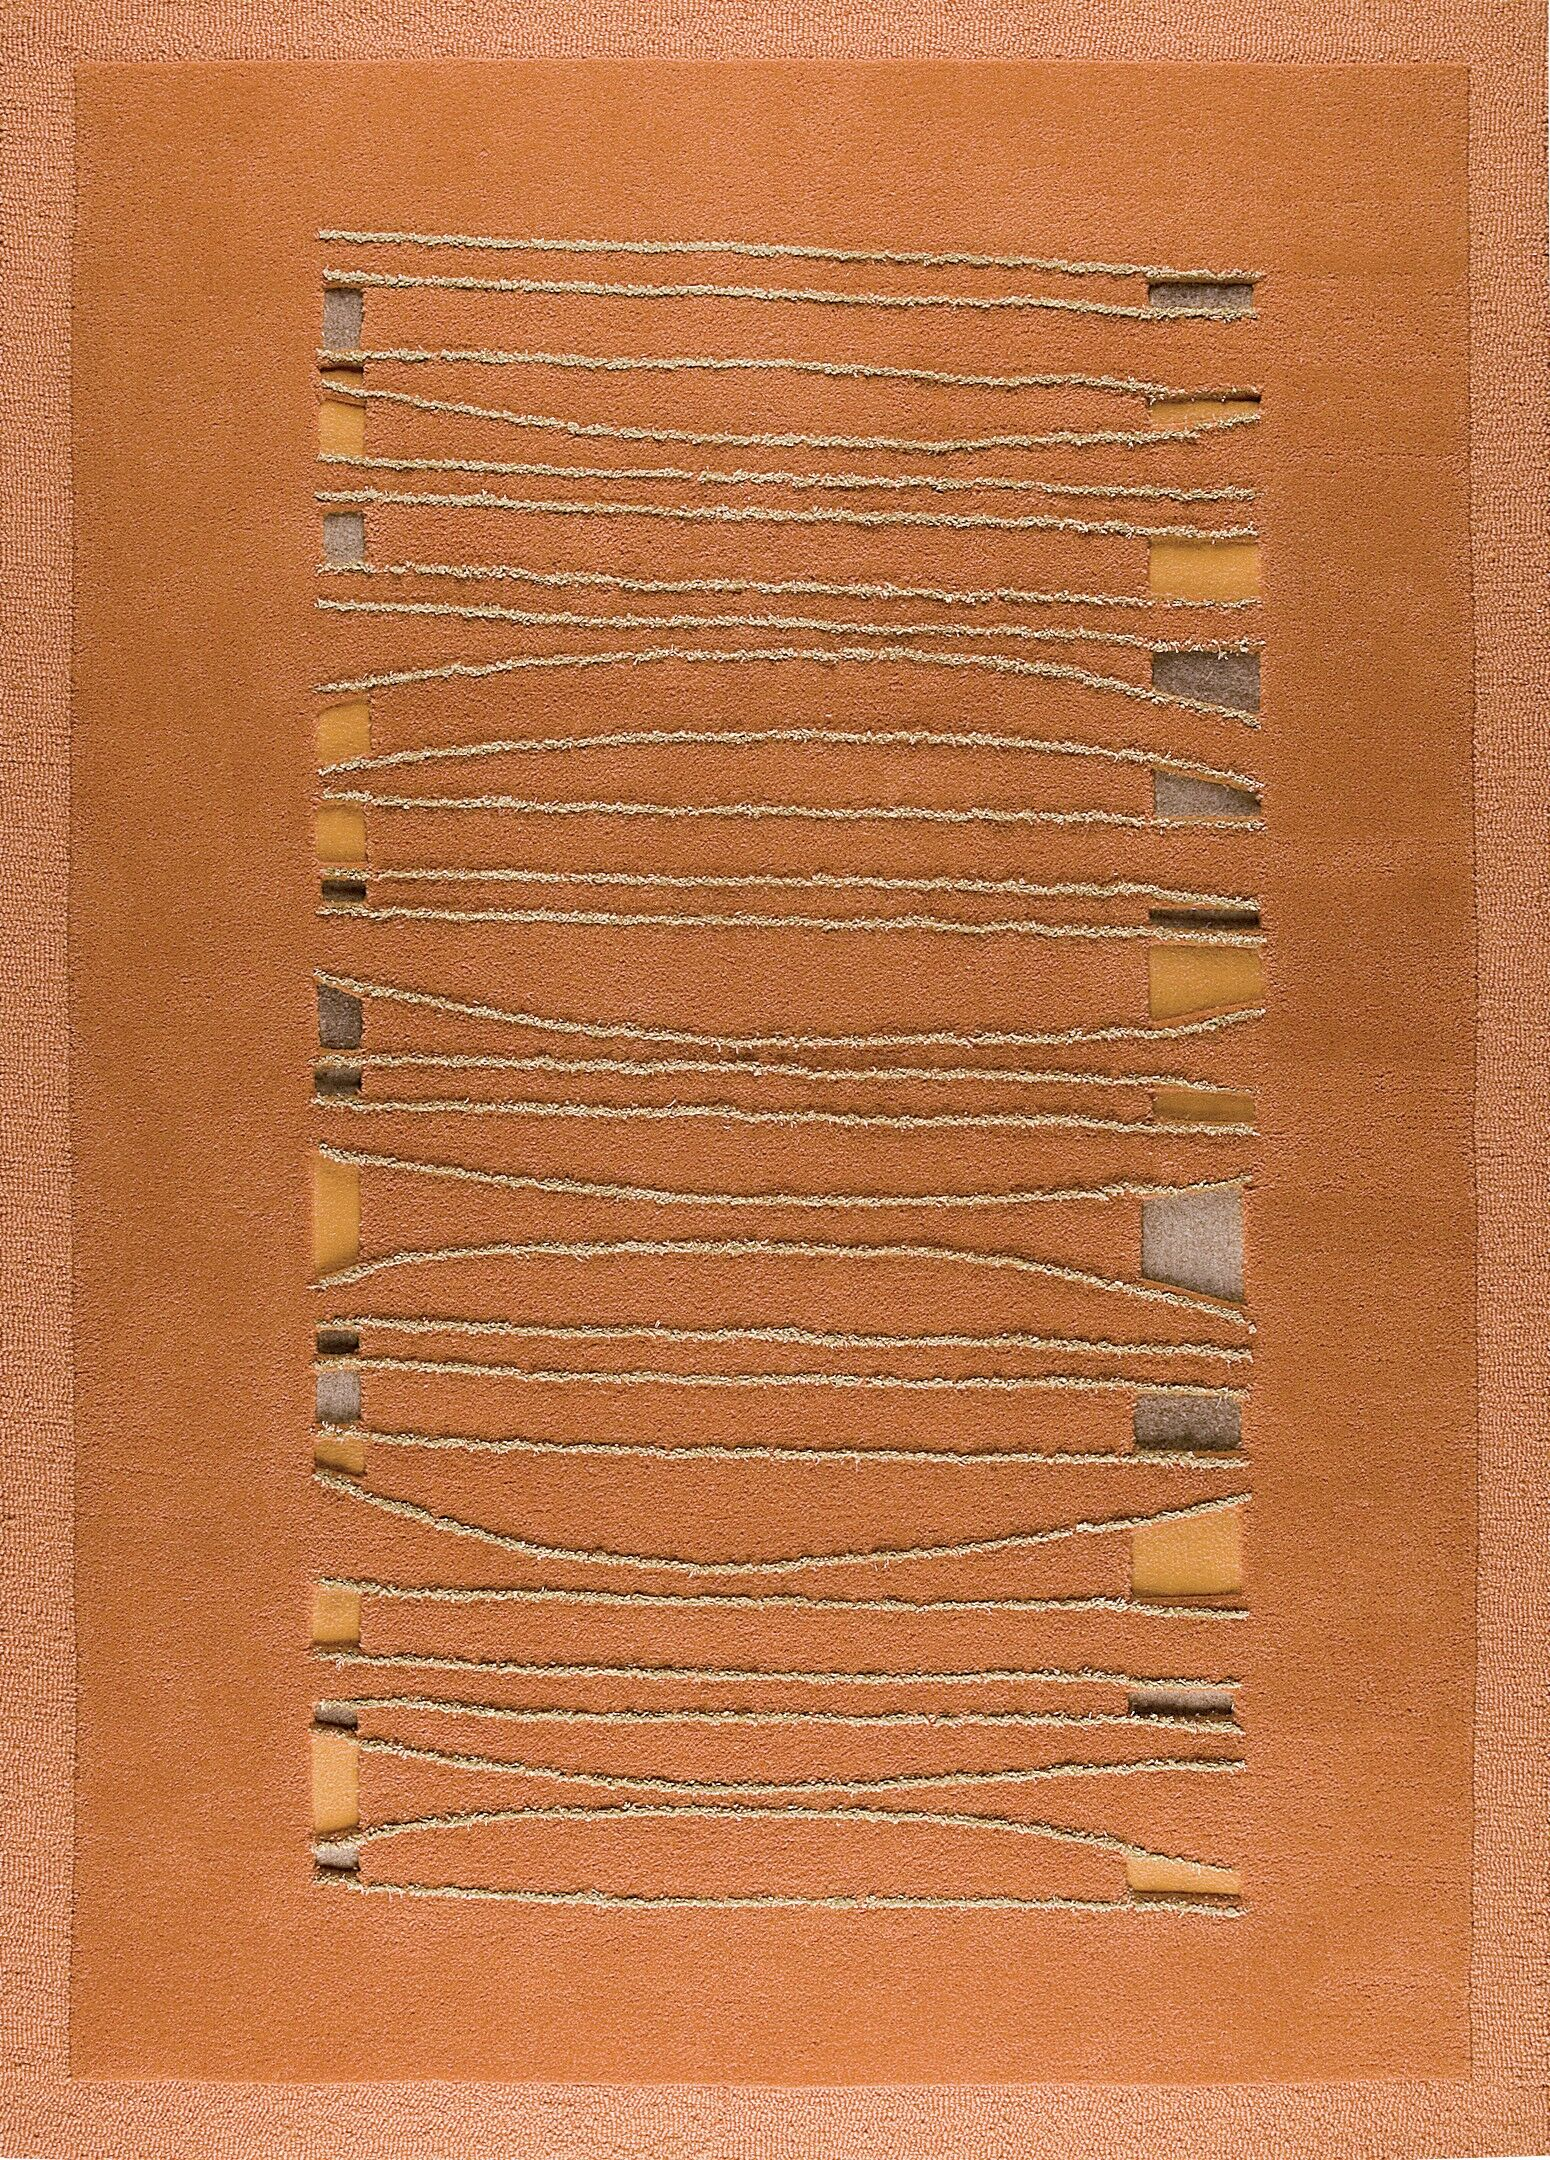 Ambrose Hand Tufted Orange Area Rug Rug Size: 8'3